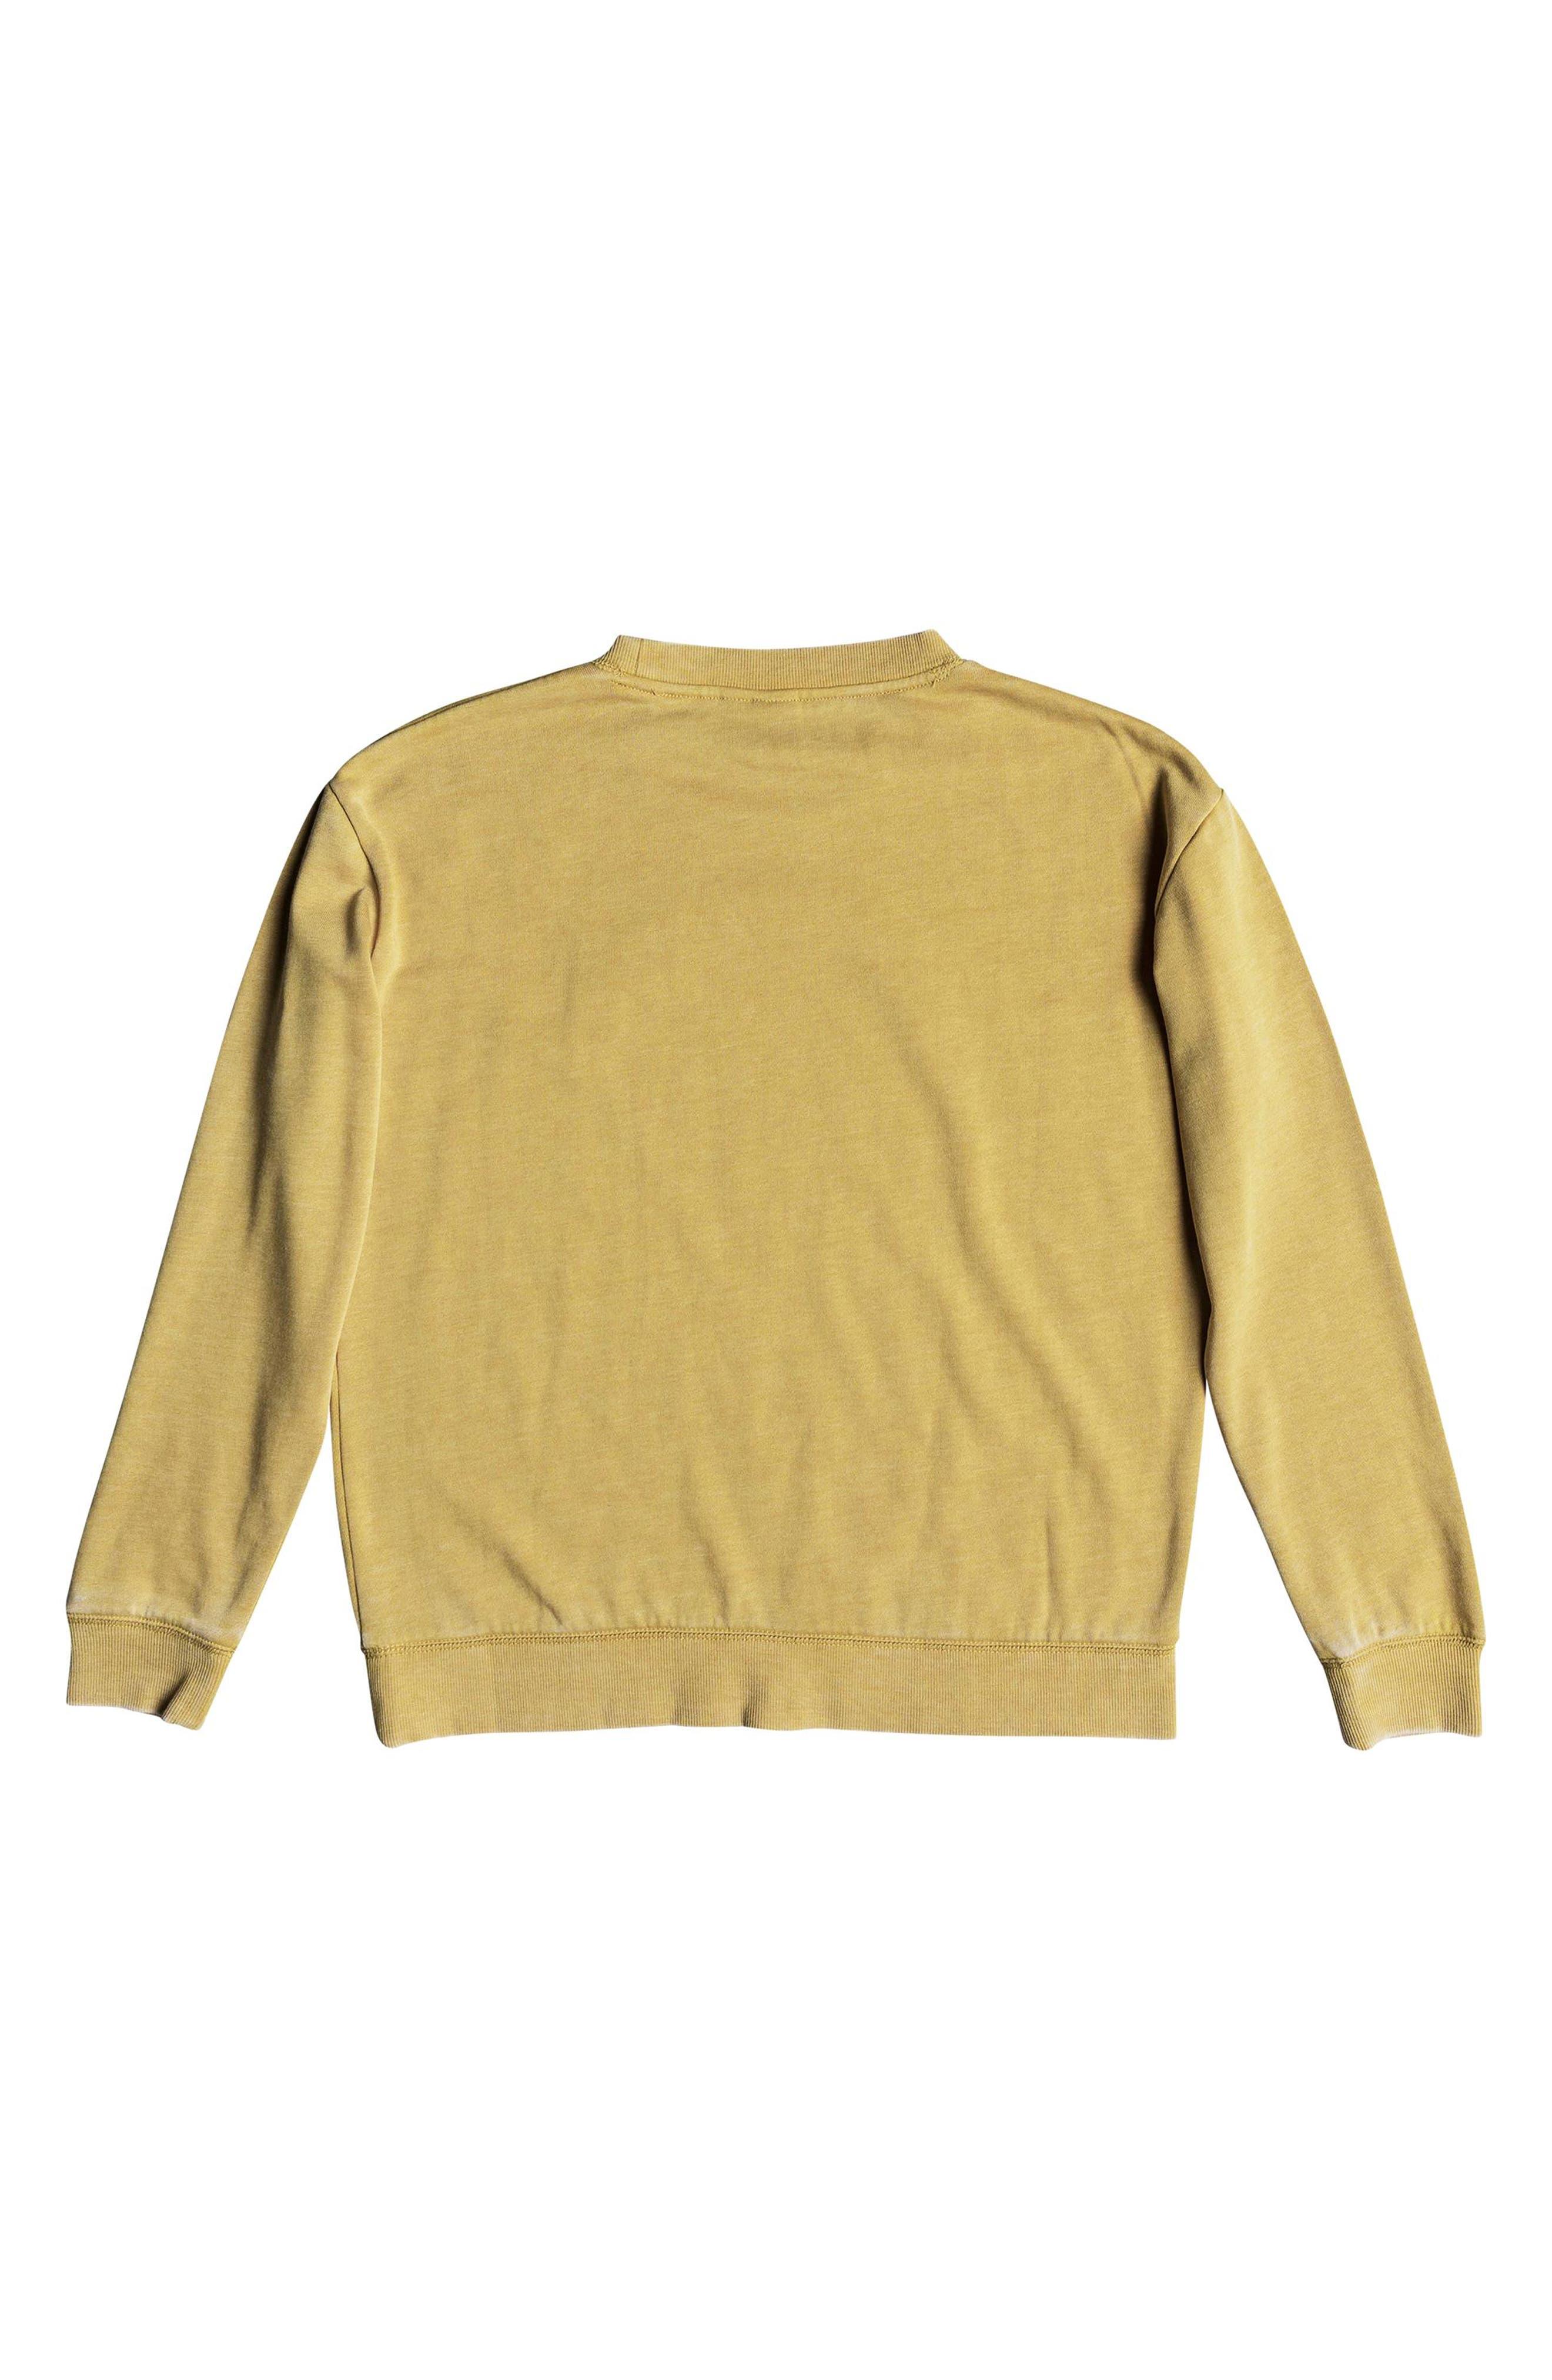 All At Sea Sweatshirt,                             Alternate thumbnail 5, color,                             700